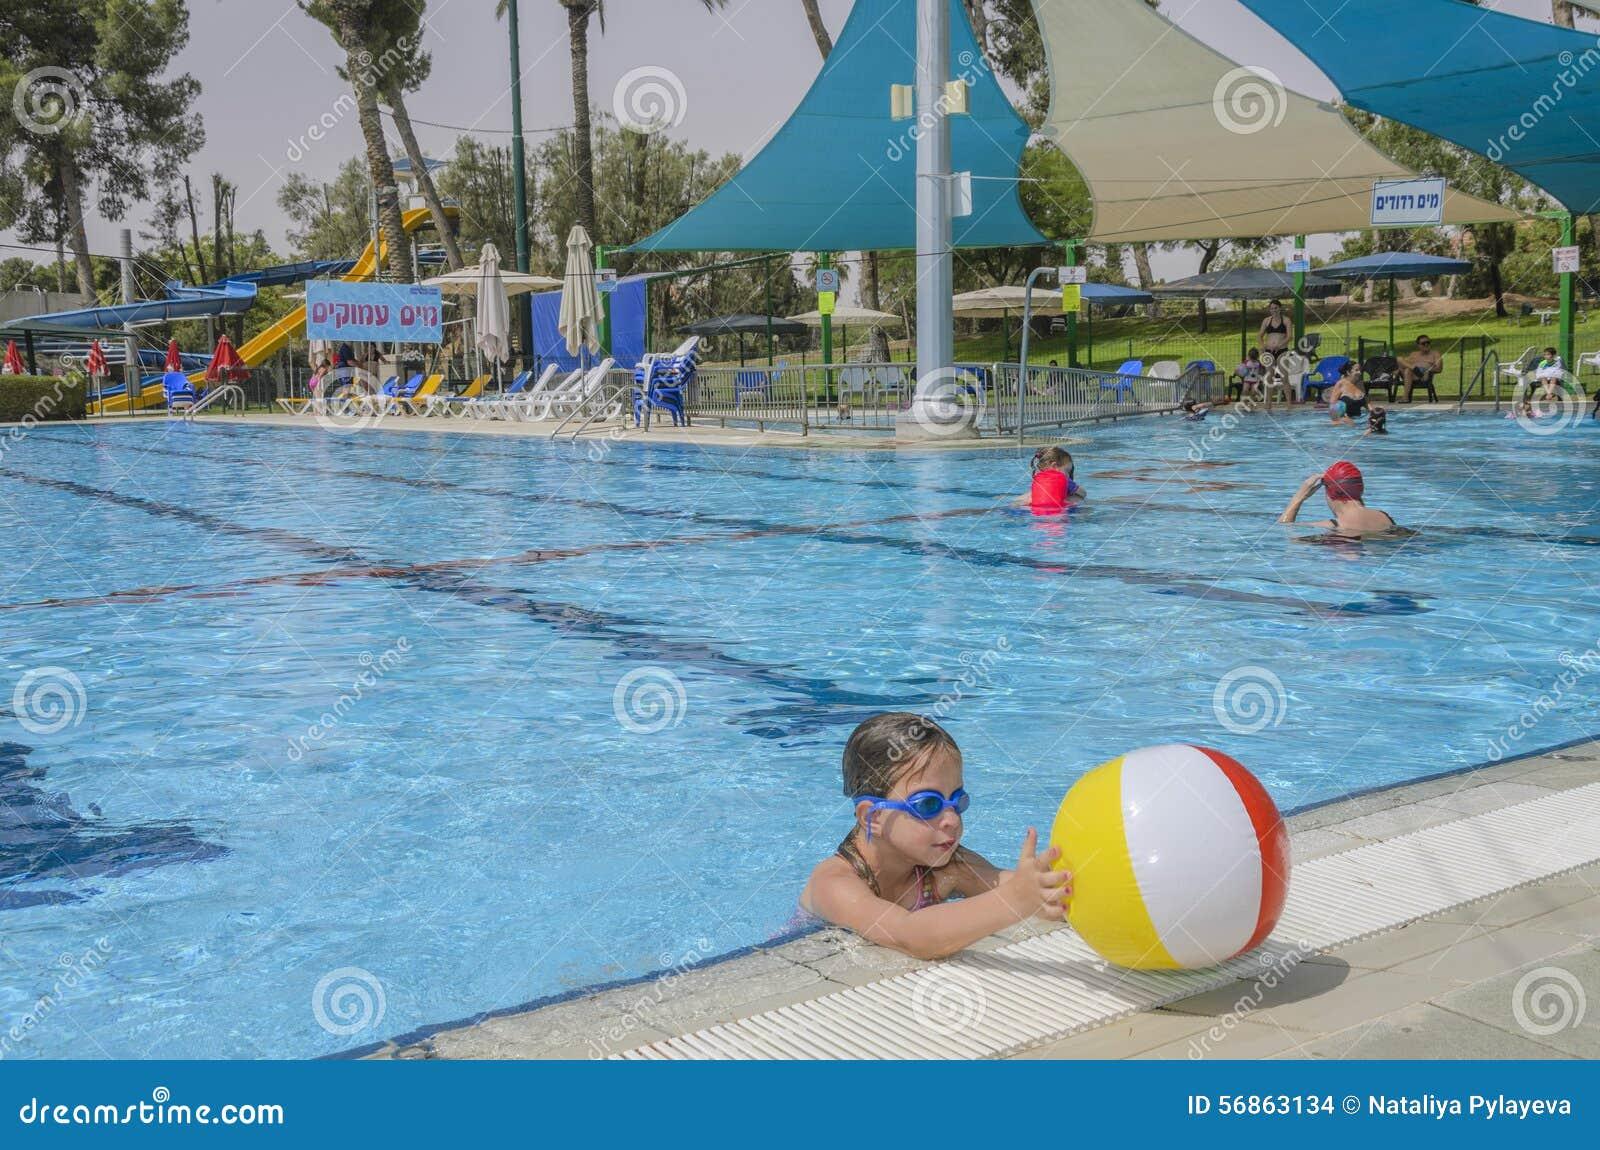 Beer sheva israel june 27 opening of the summer season for Opening pool for summer